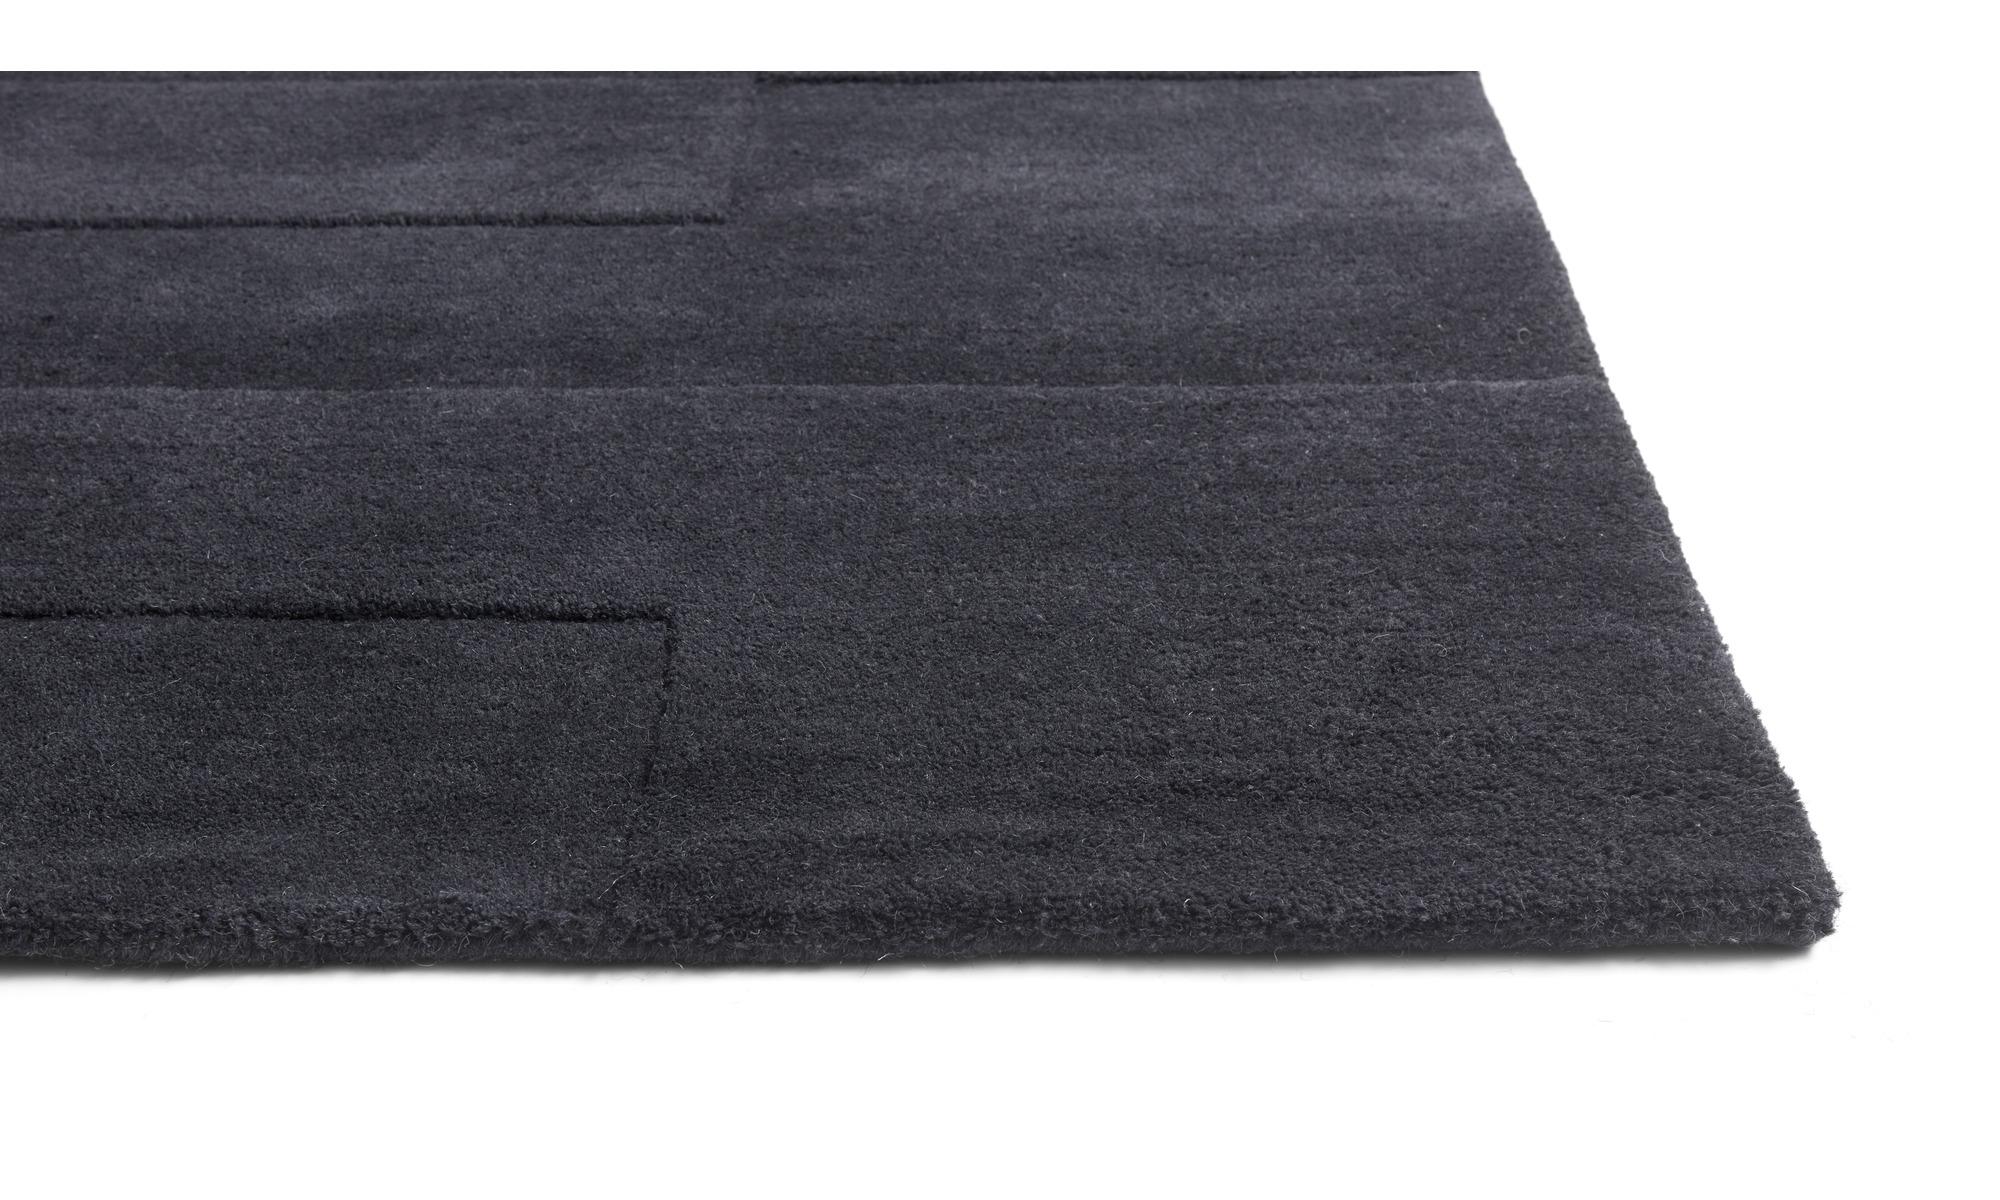 tapis rectangulaires tapis cosenza boconcept. Black Bedroom Furniture Sets. Home Design Ideas